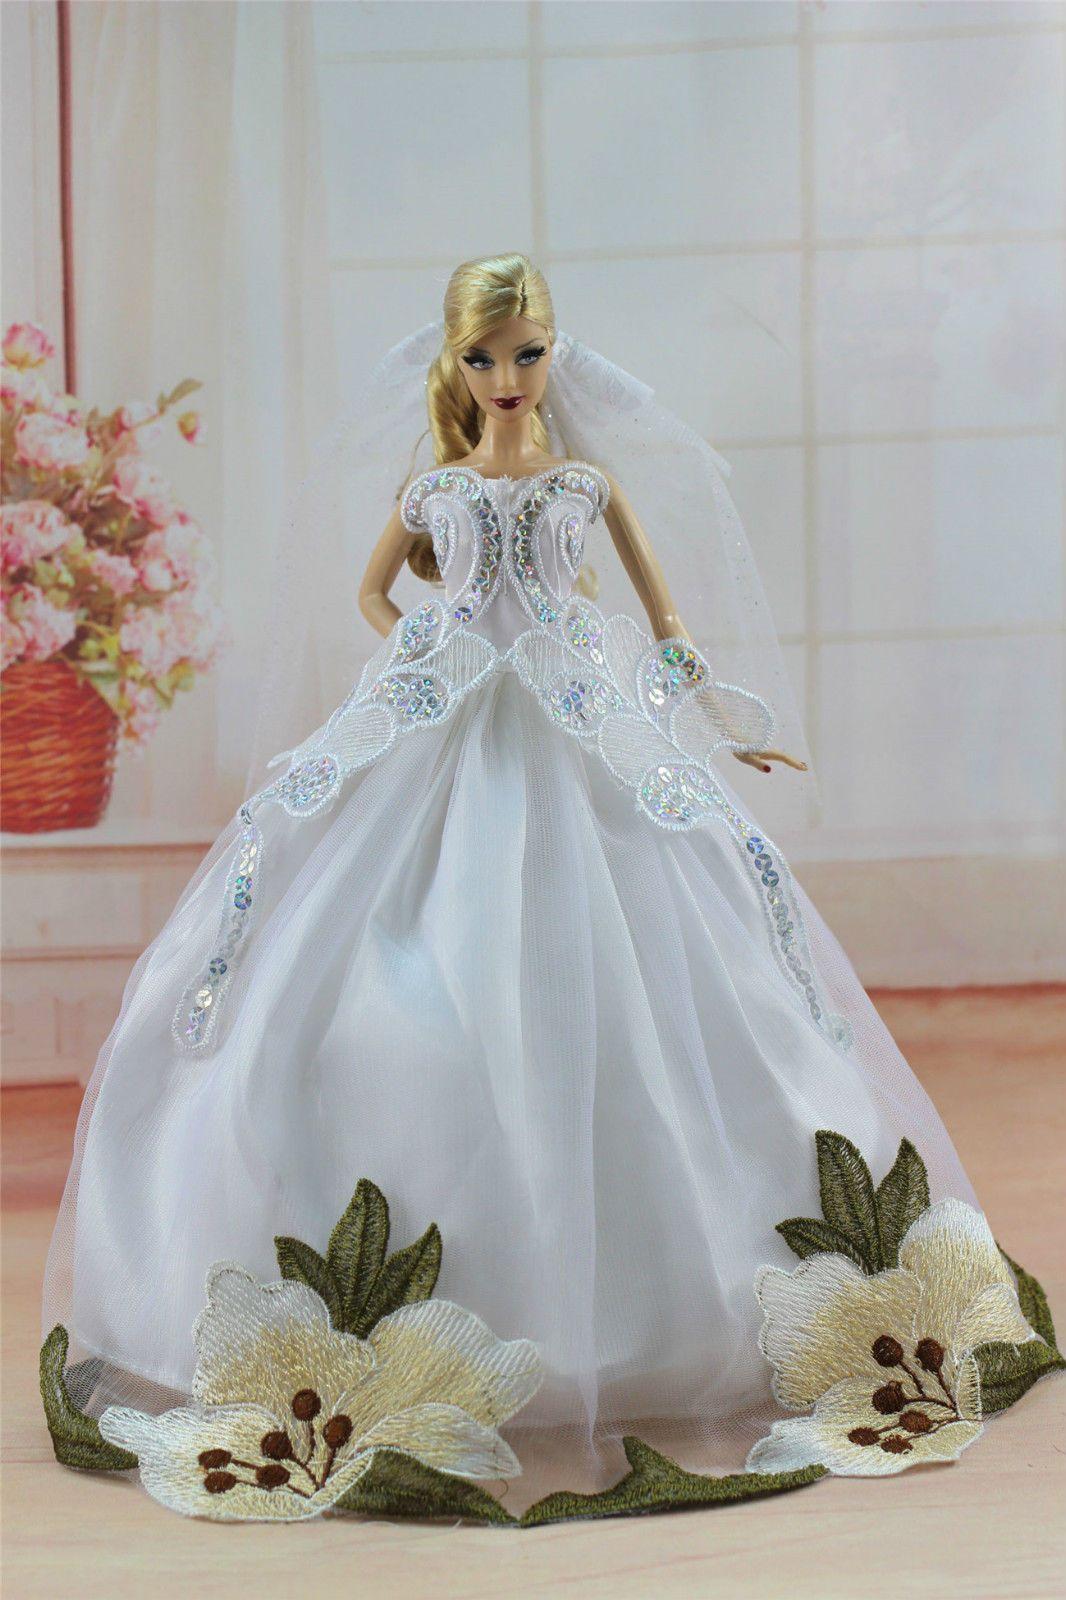 3.89 GBP - White Fashion Princess Dress Wedding Clothes/Gown +Veil ...